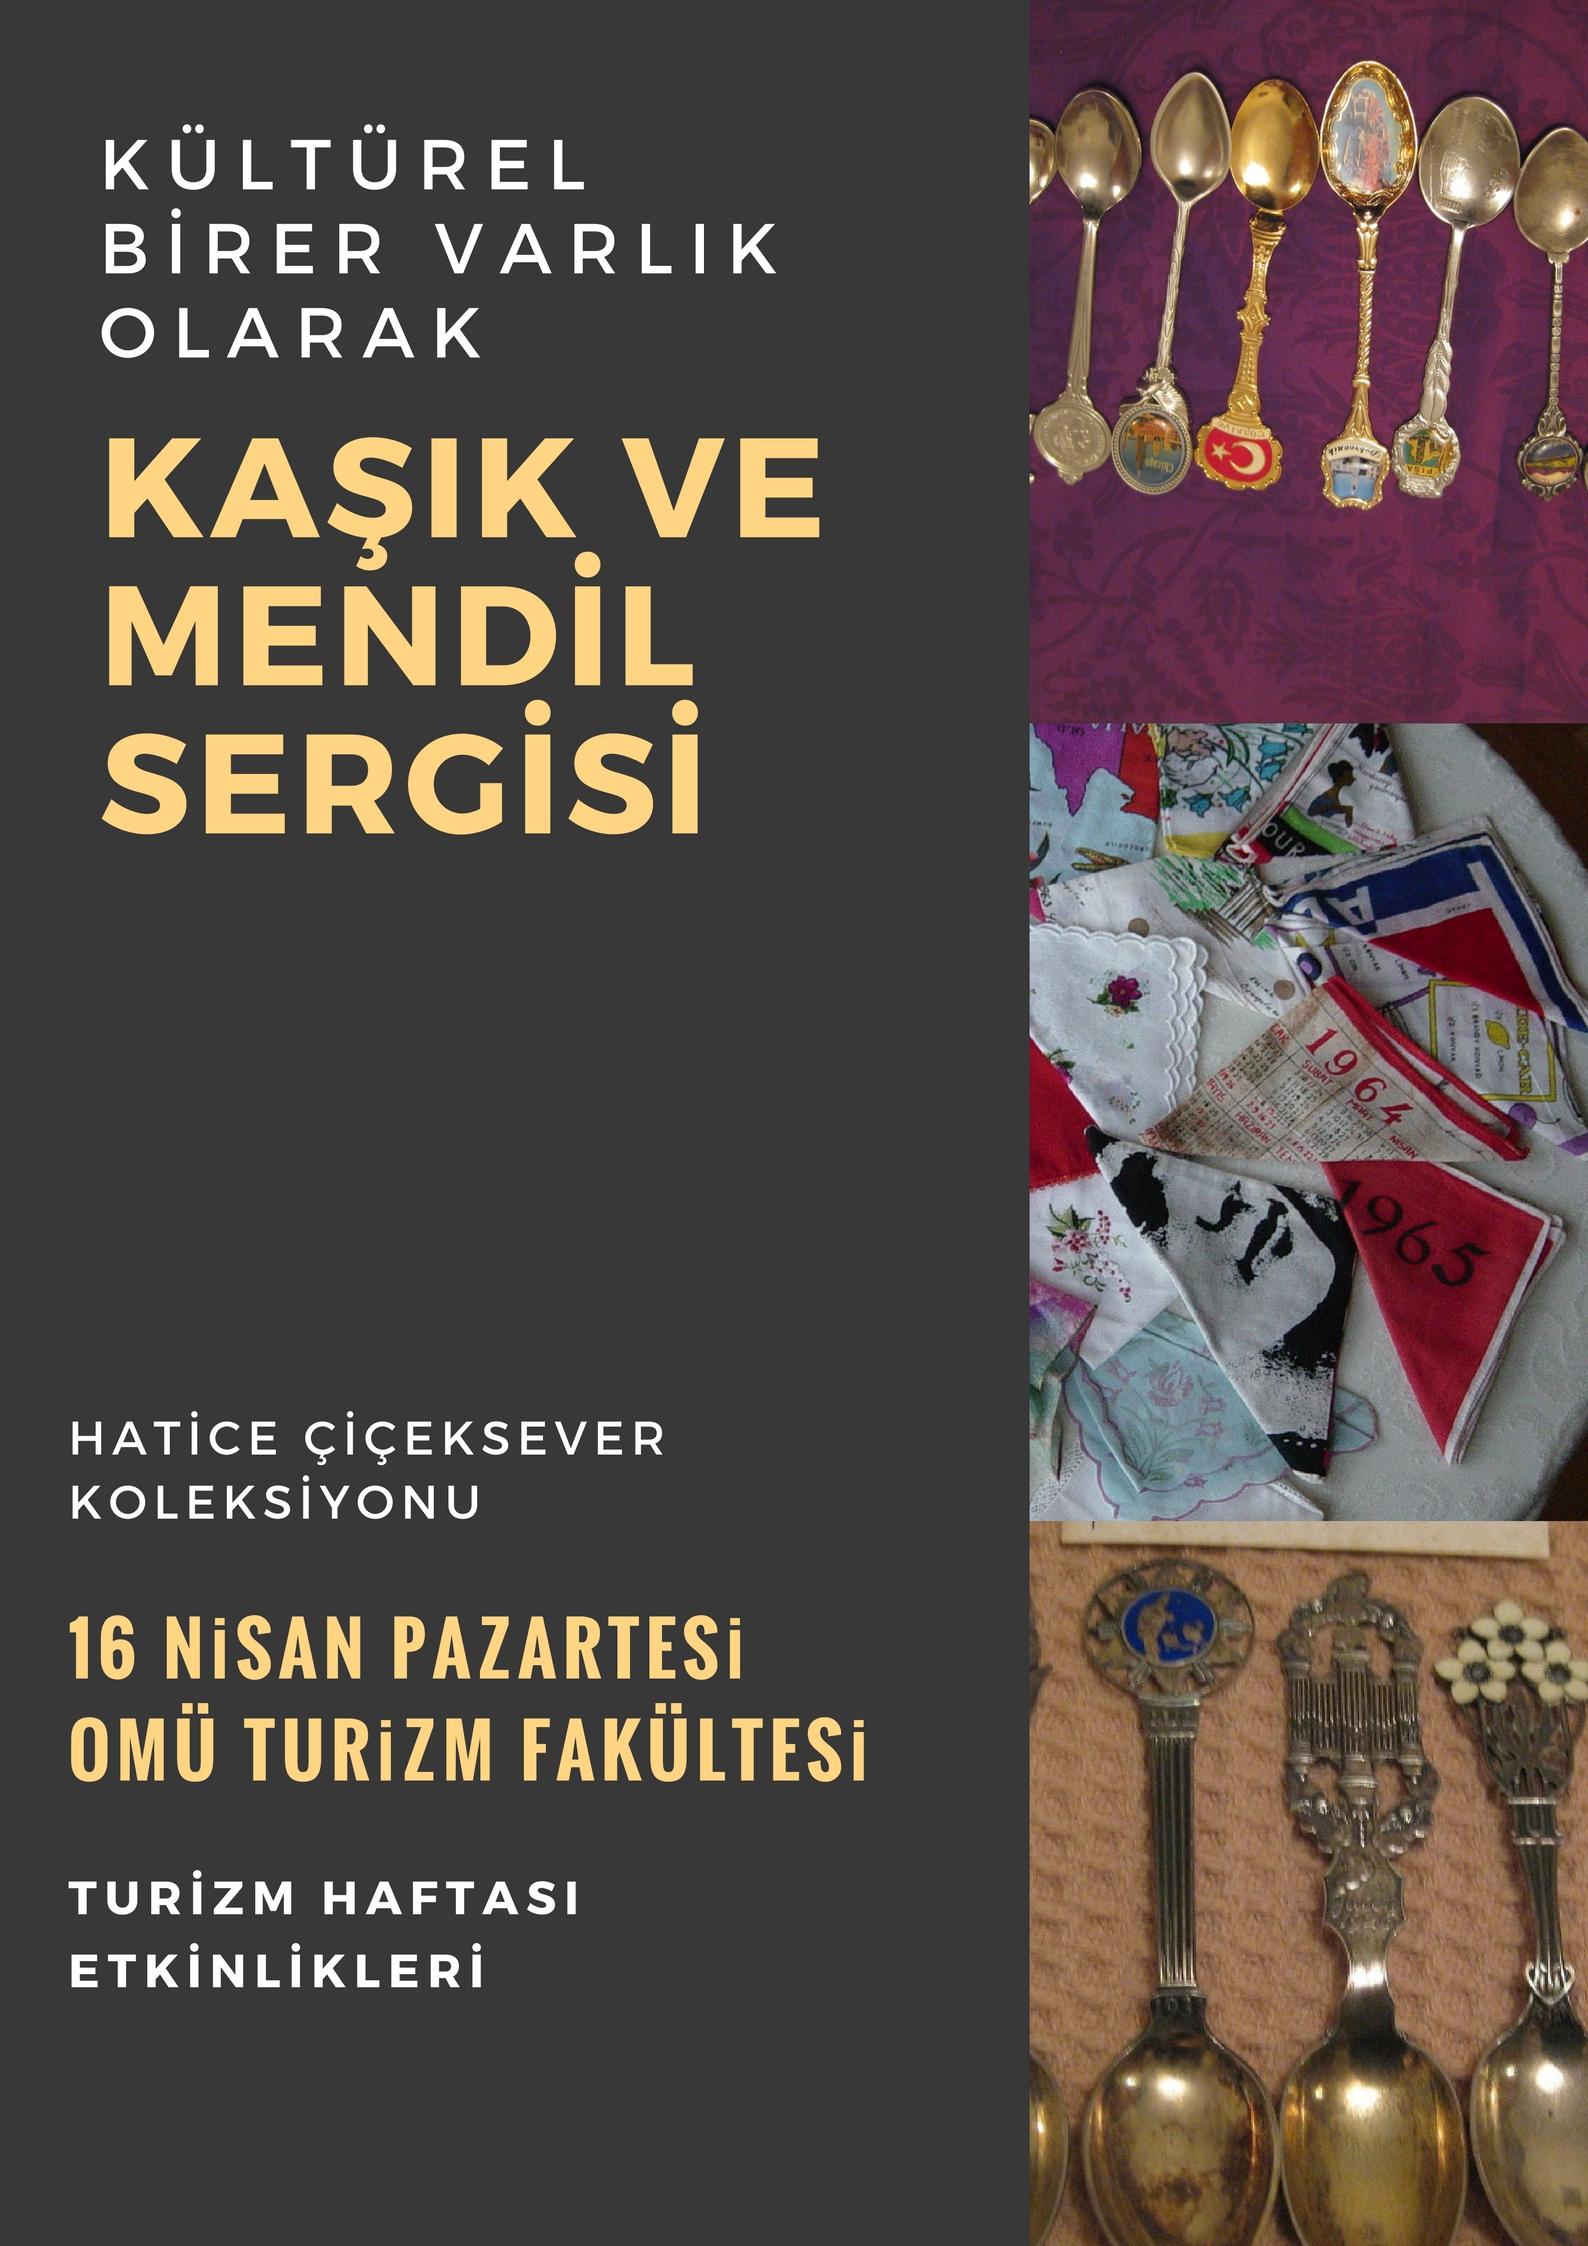 http://www.omu.edu.tr/sites/default/files/kasik_ve_mendil_poster.jpg